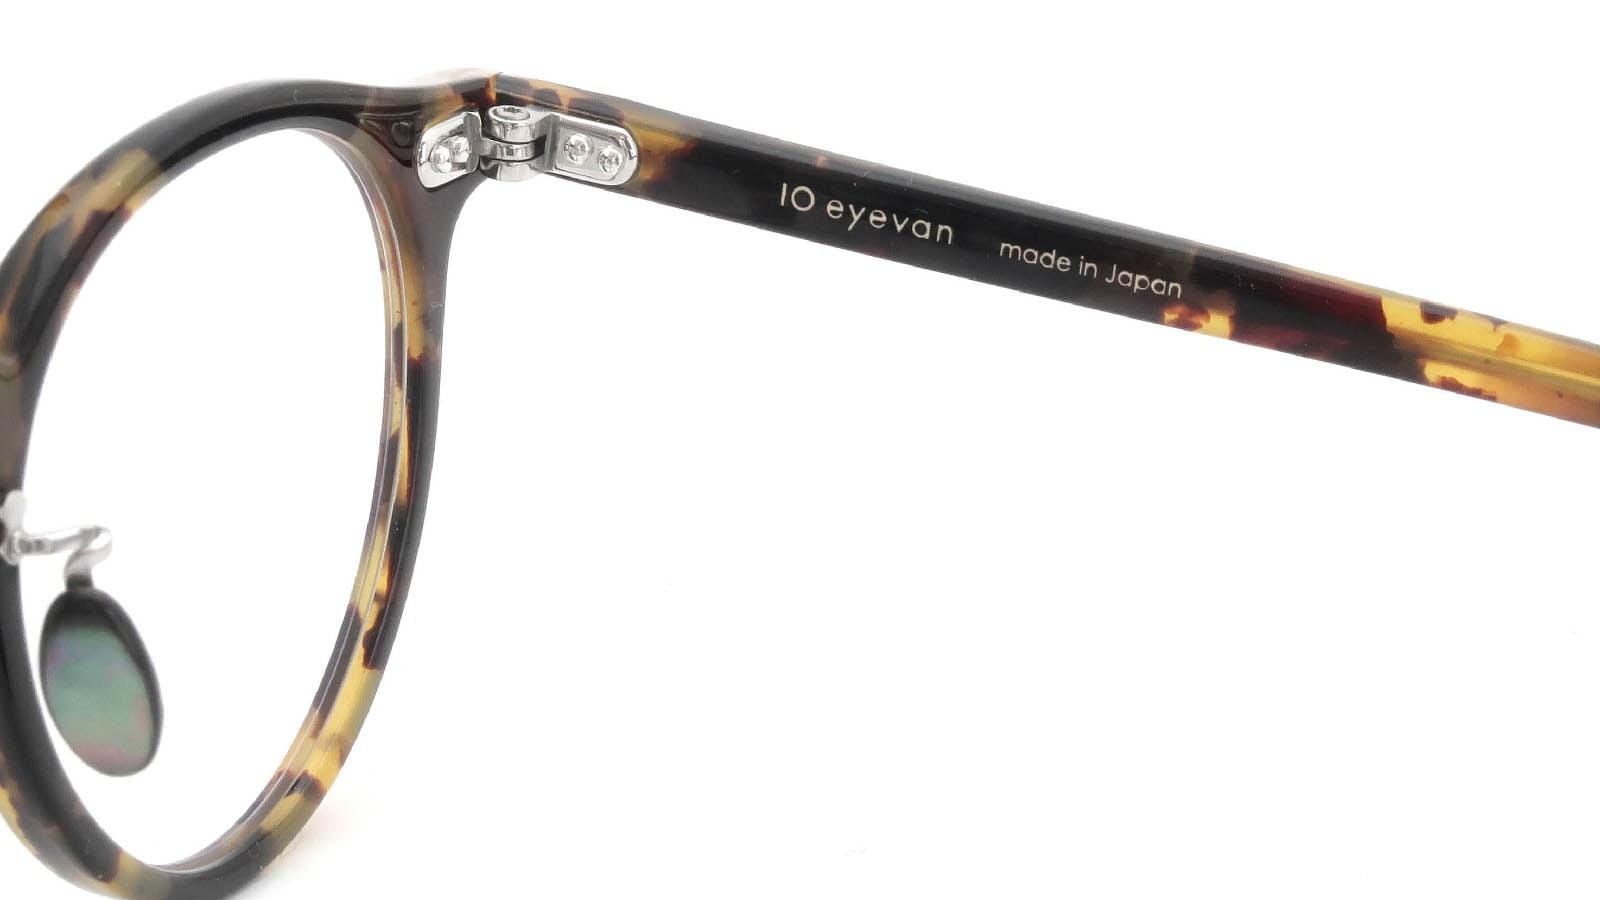 10 eyevan NO.3 Ⅲ 45size 11